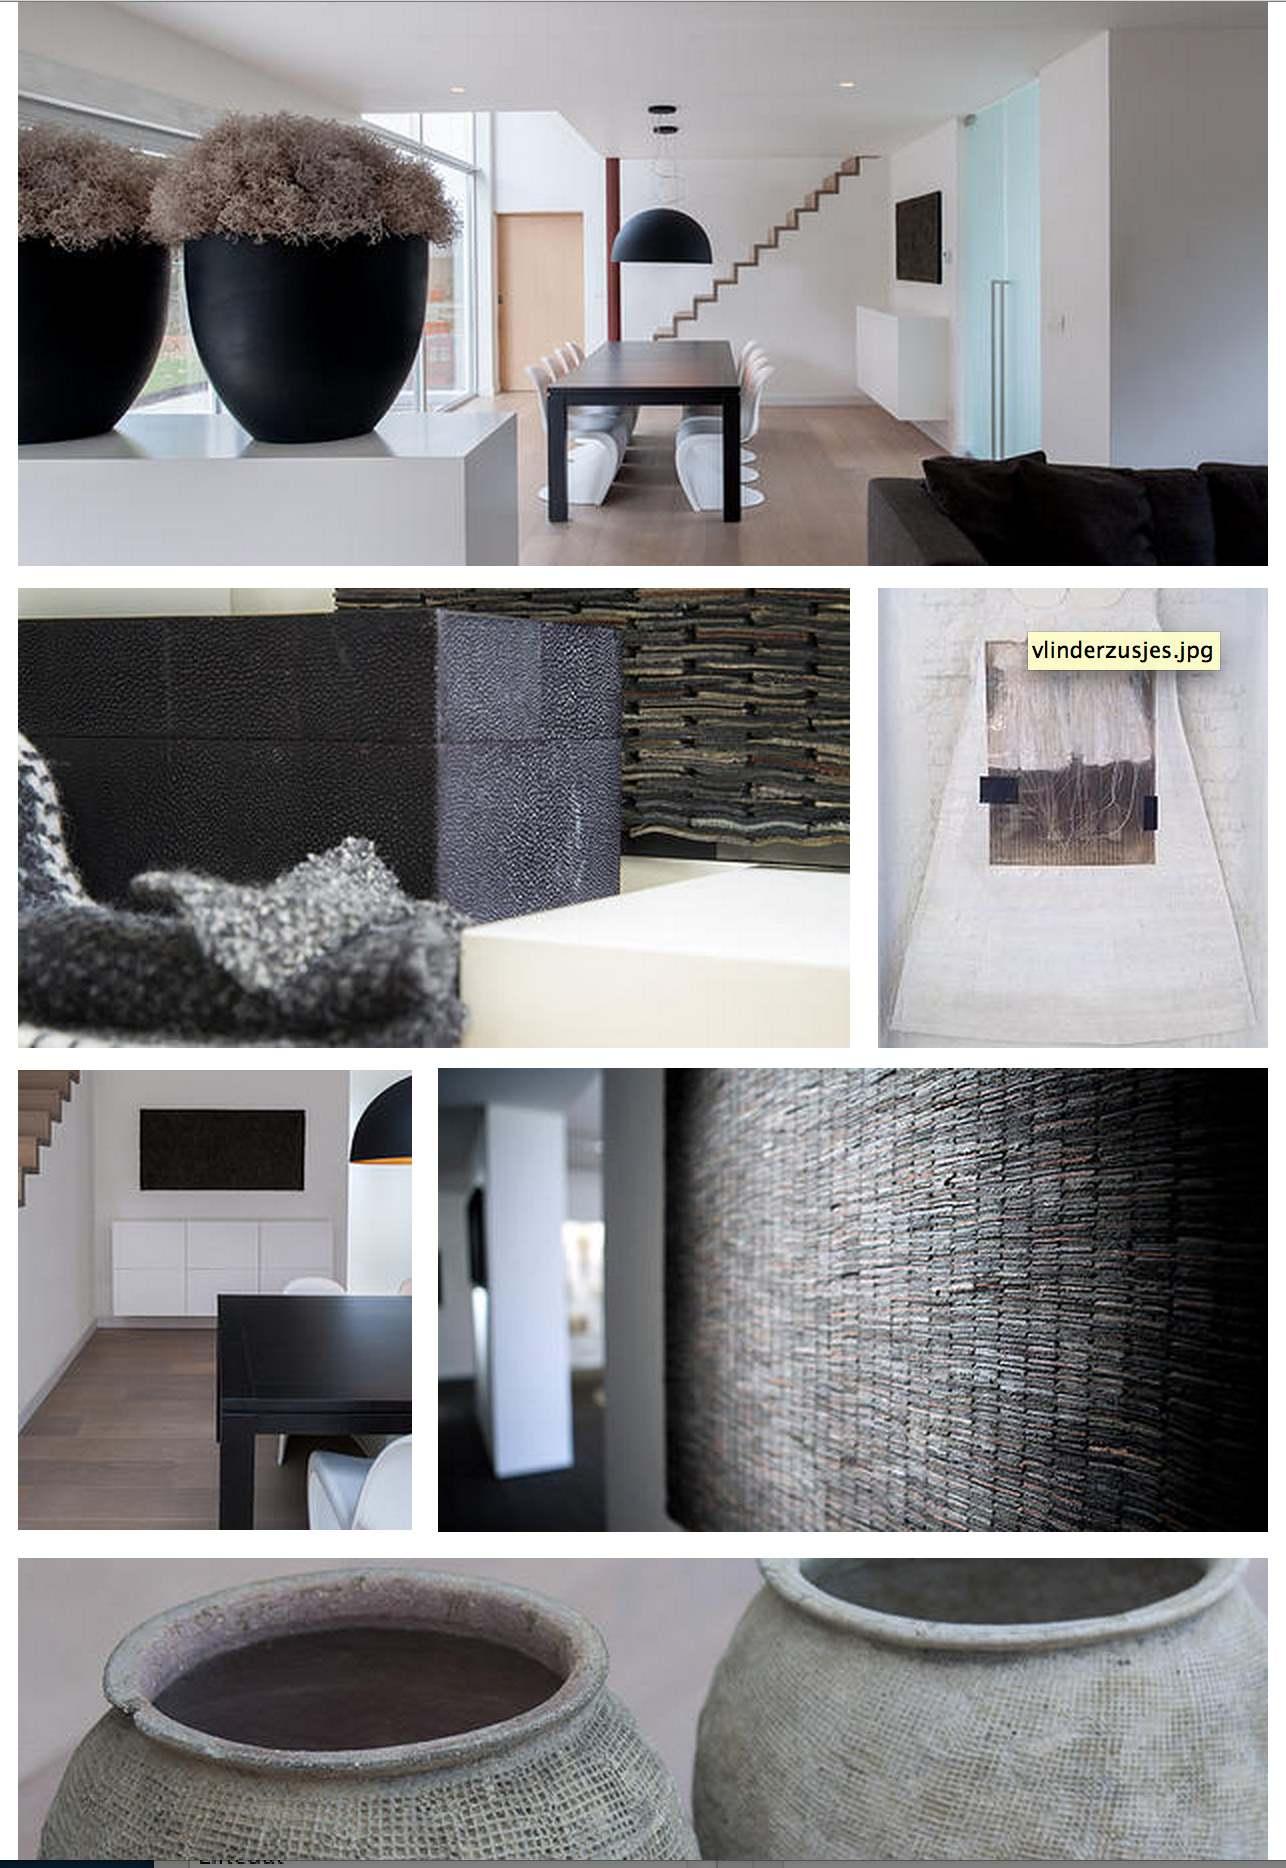 Interieurontwerper Holsbeek | Anneleen Claes - Interieurstyliste